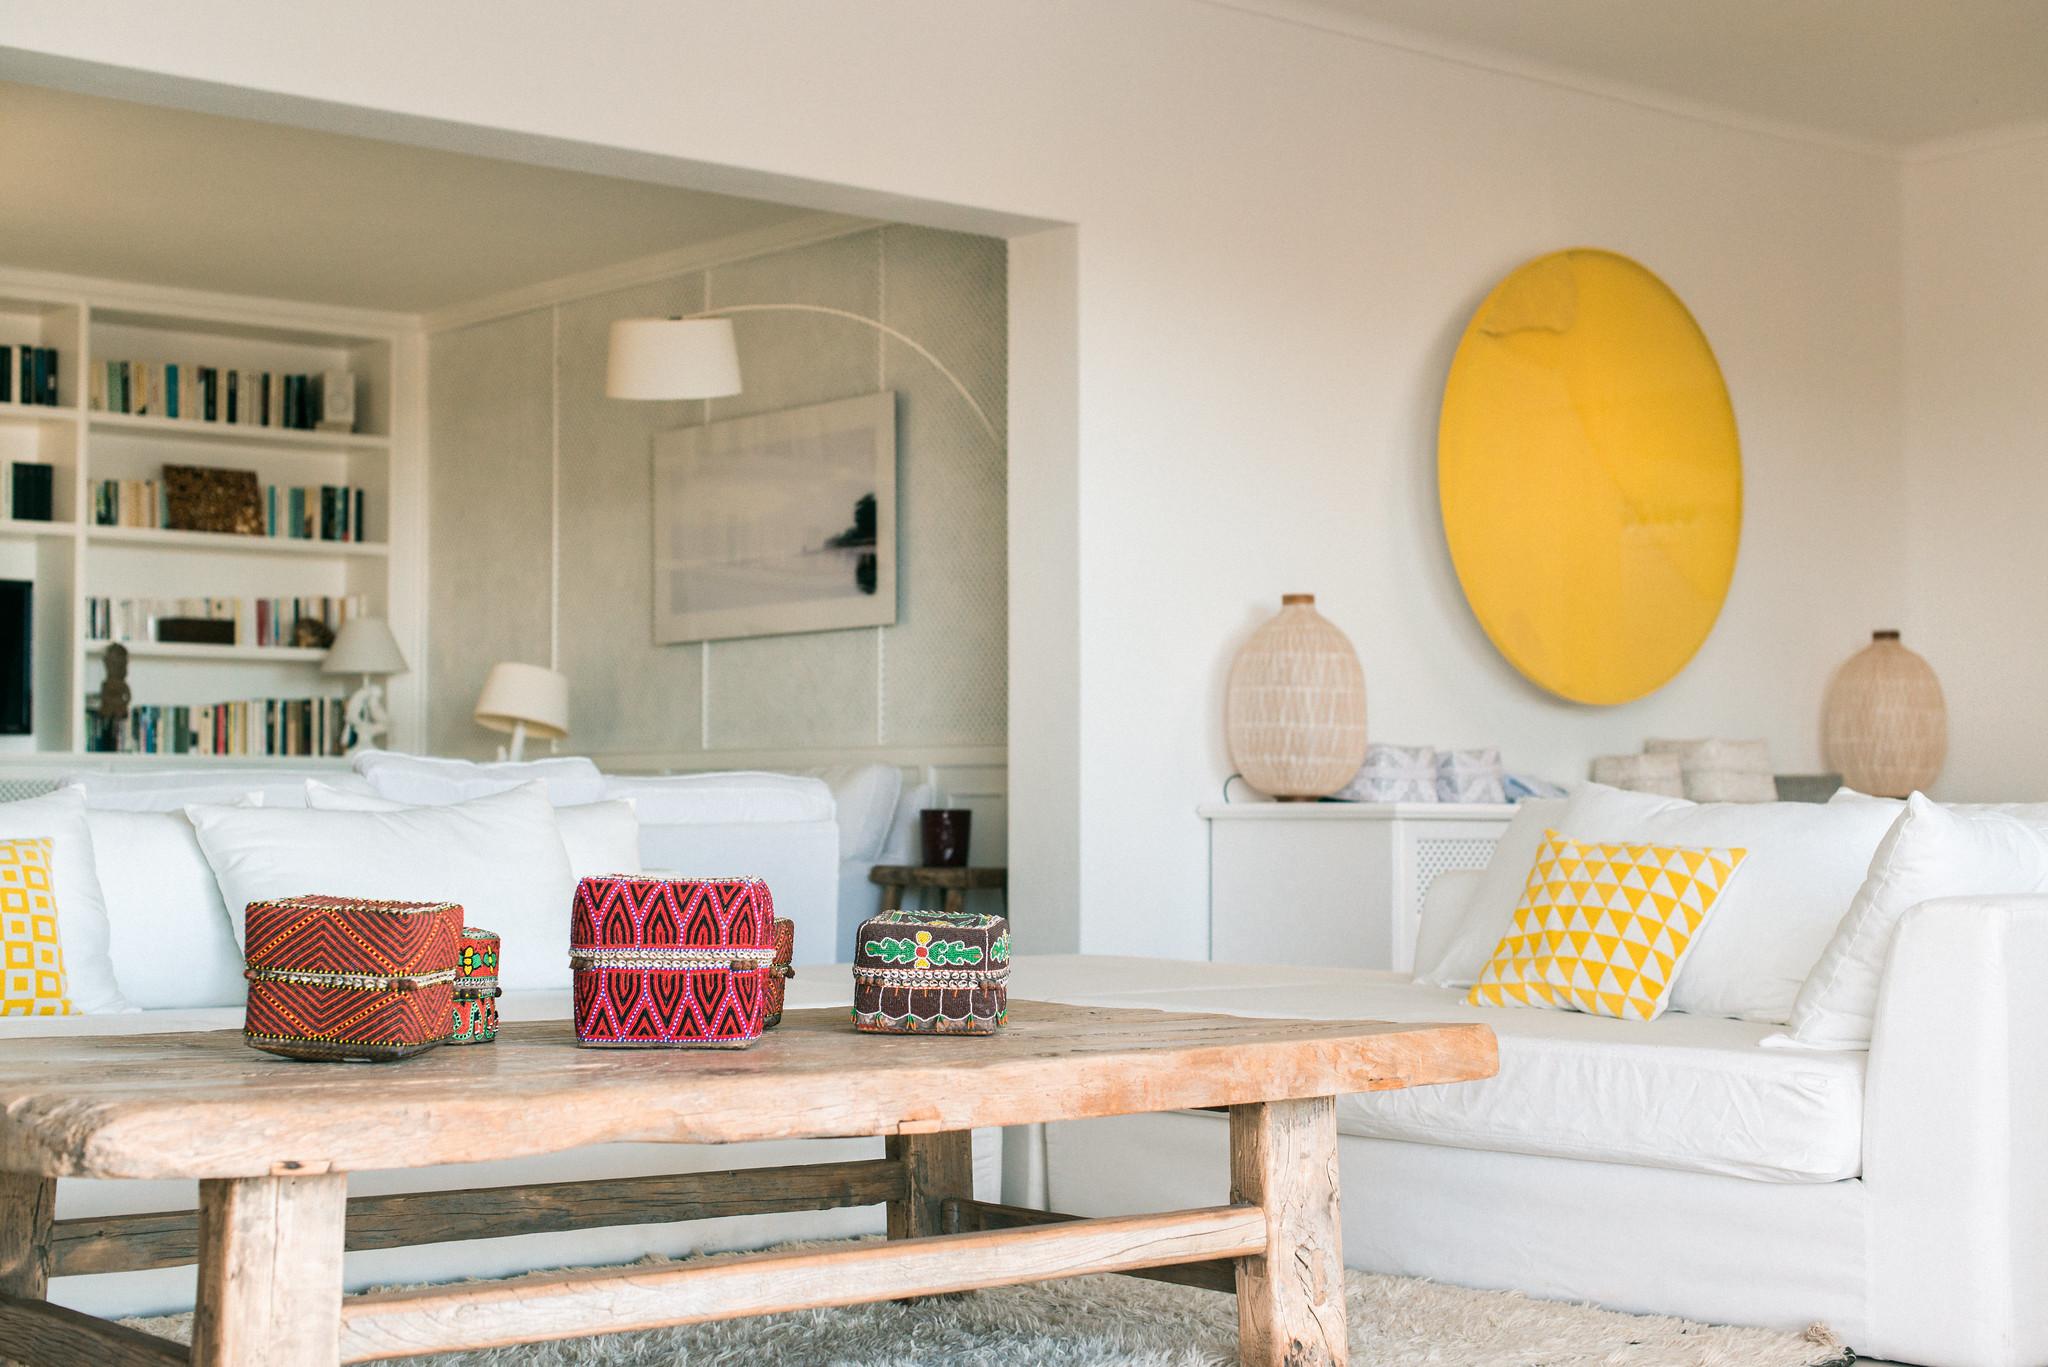 https://www.white-ibiza.com/wp-content/uploads/2020/06/white-ibiza-villas-casa-odette-interior-living-room2.jpg